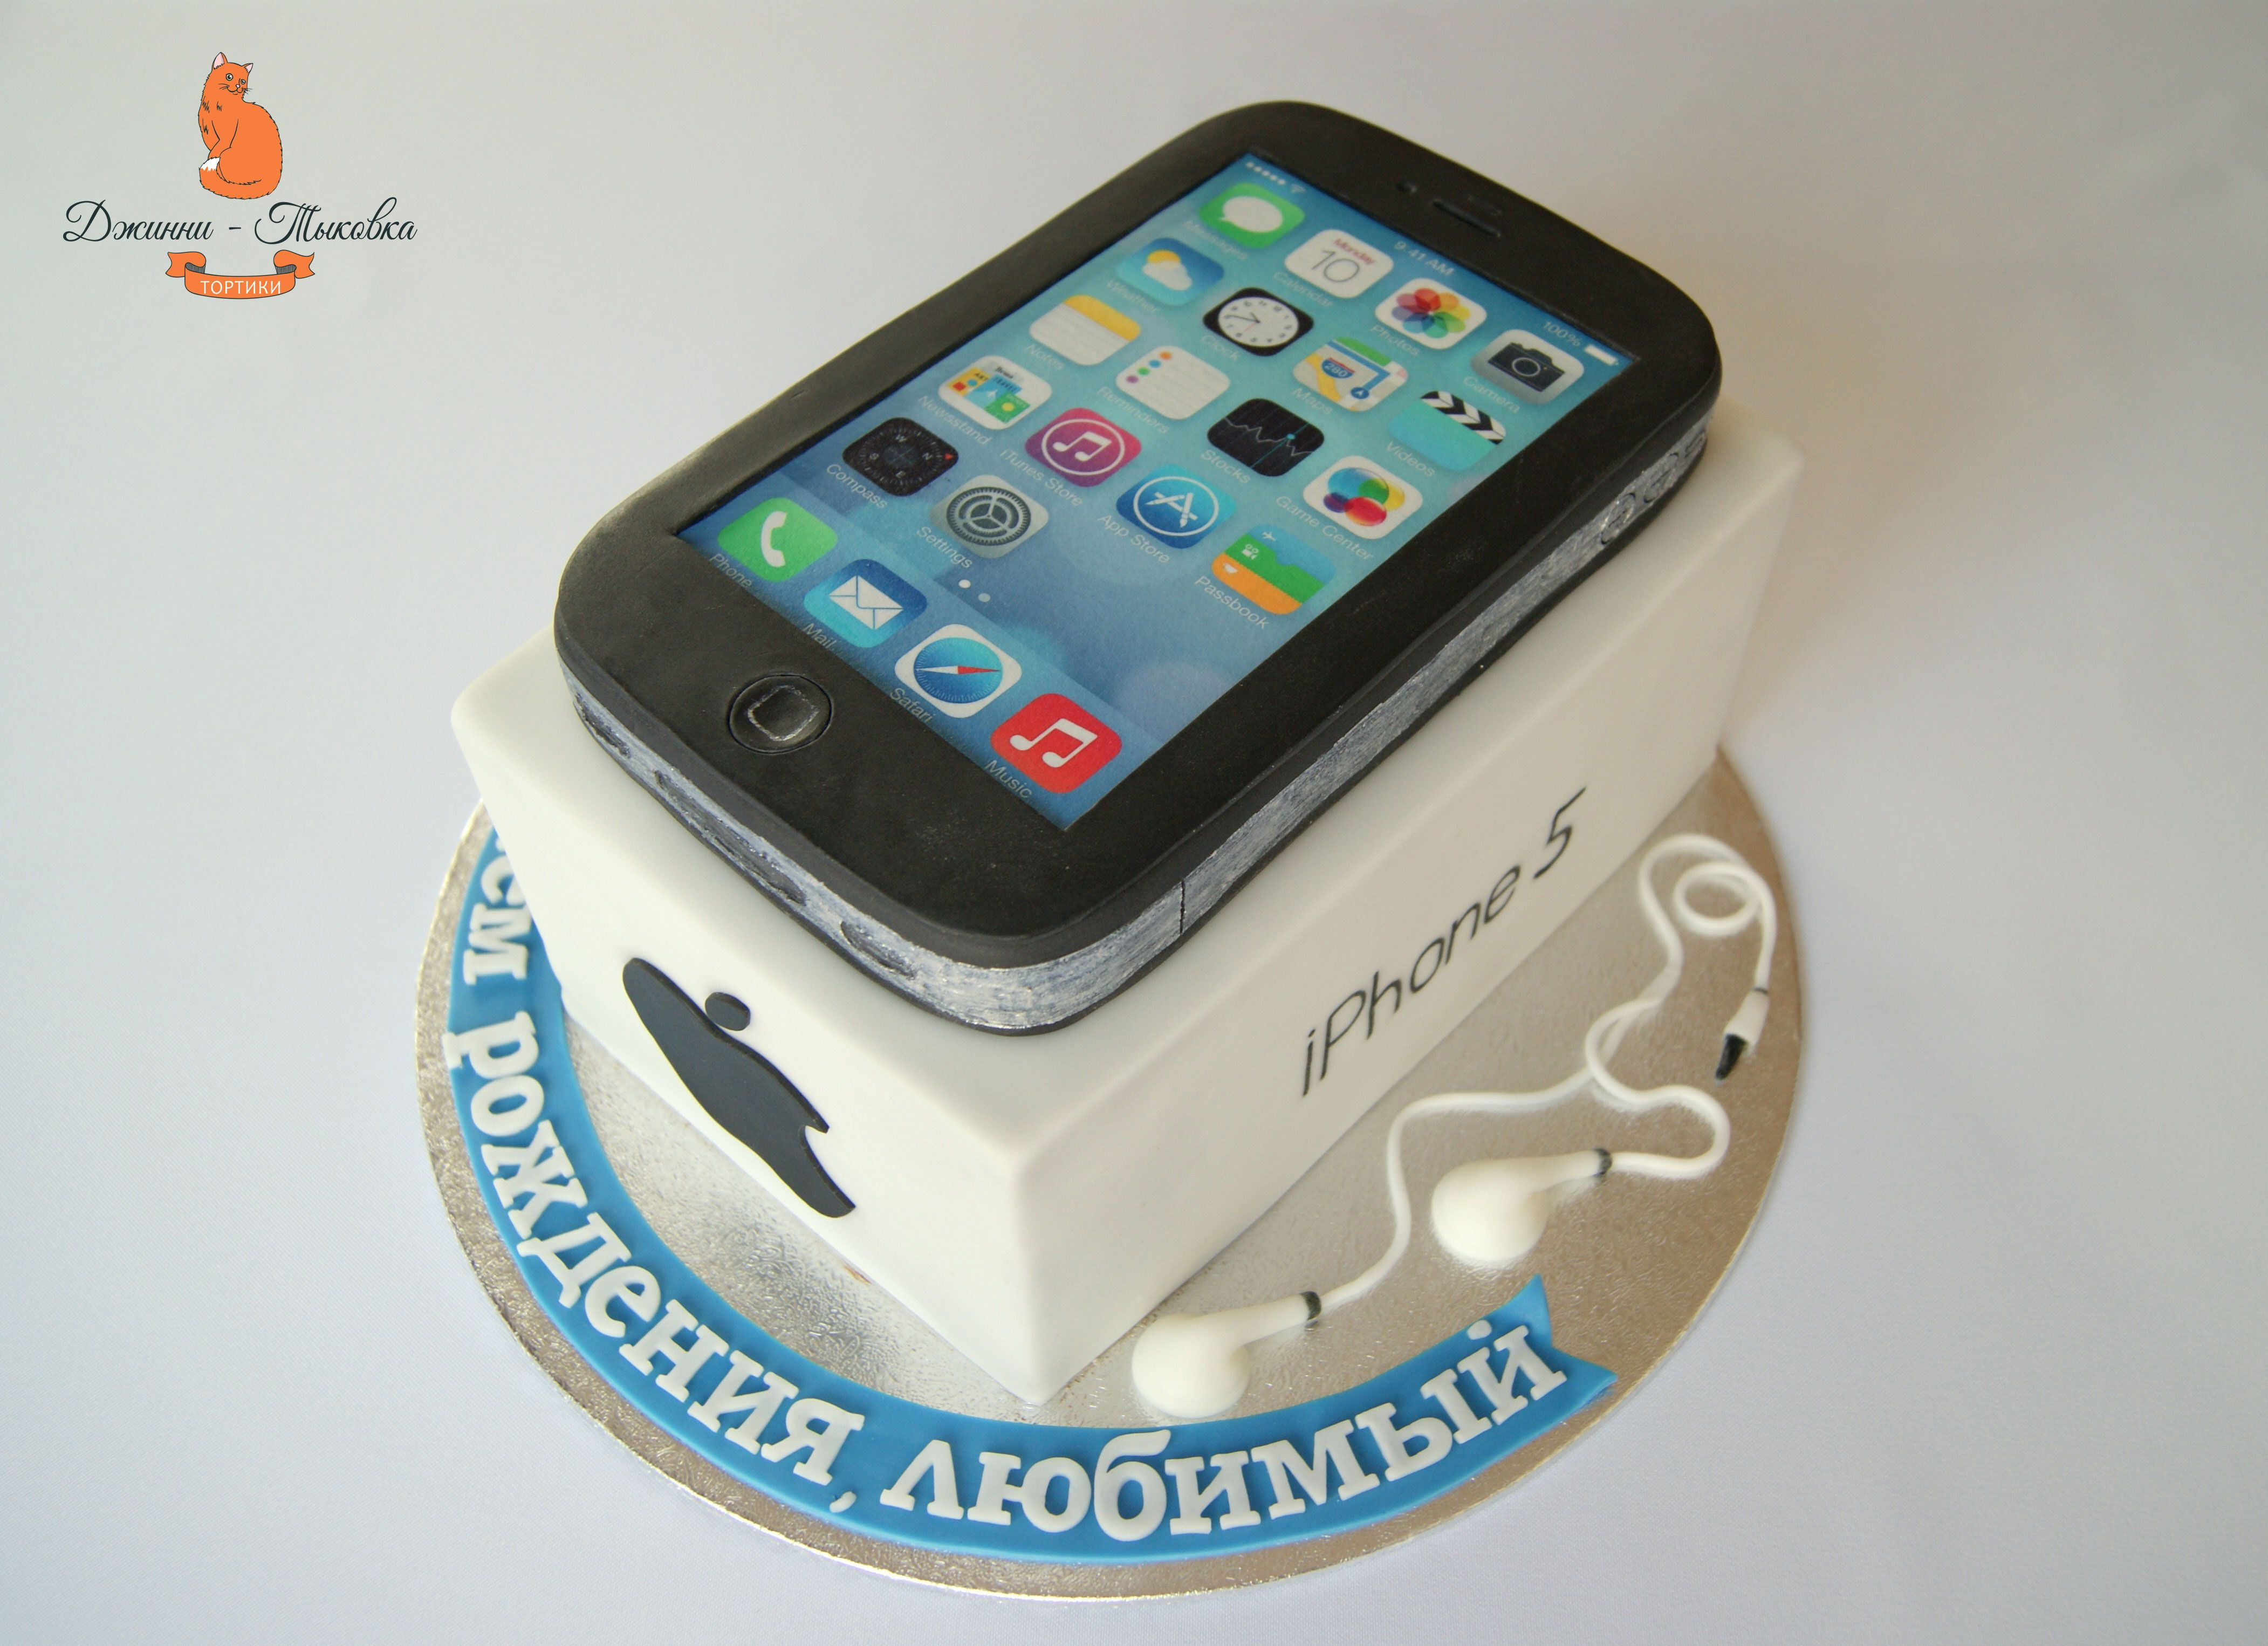 iphone cake ideas iPhone birthday cake Iphone cakes ideas